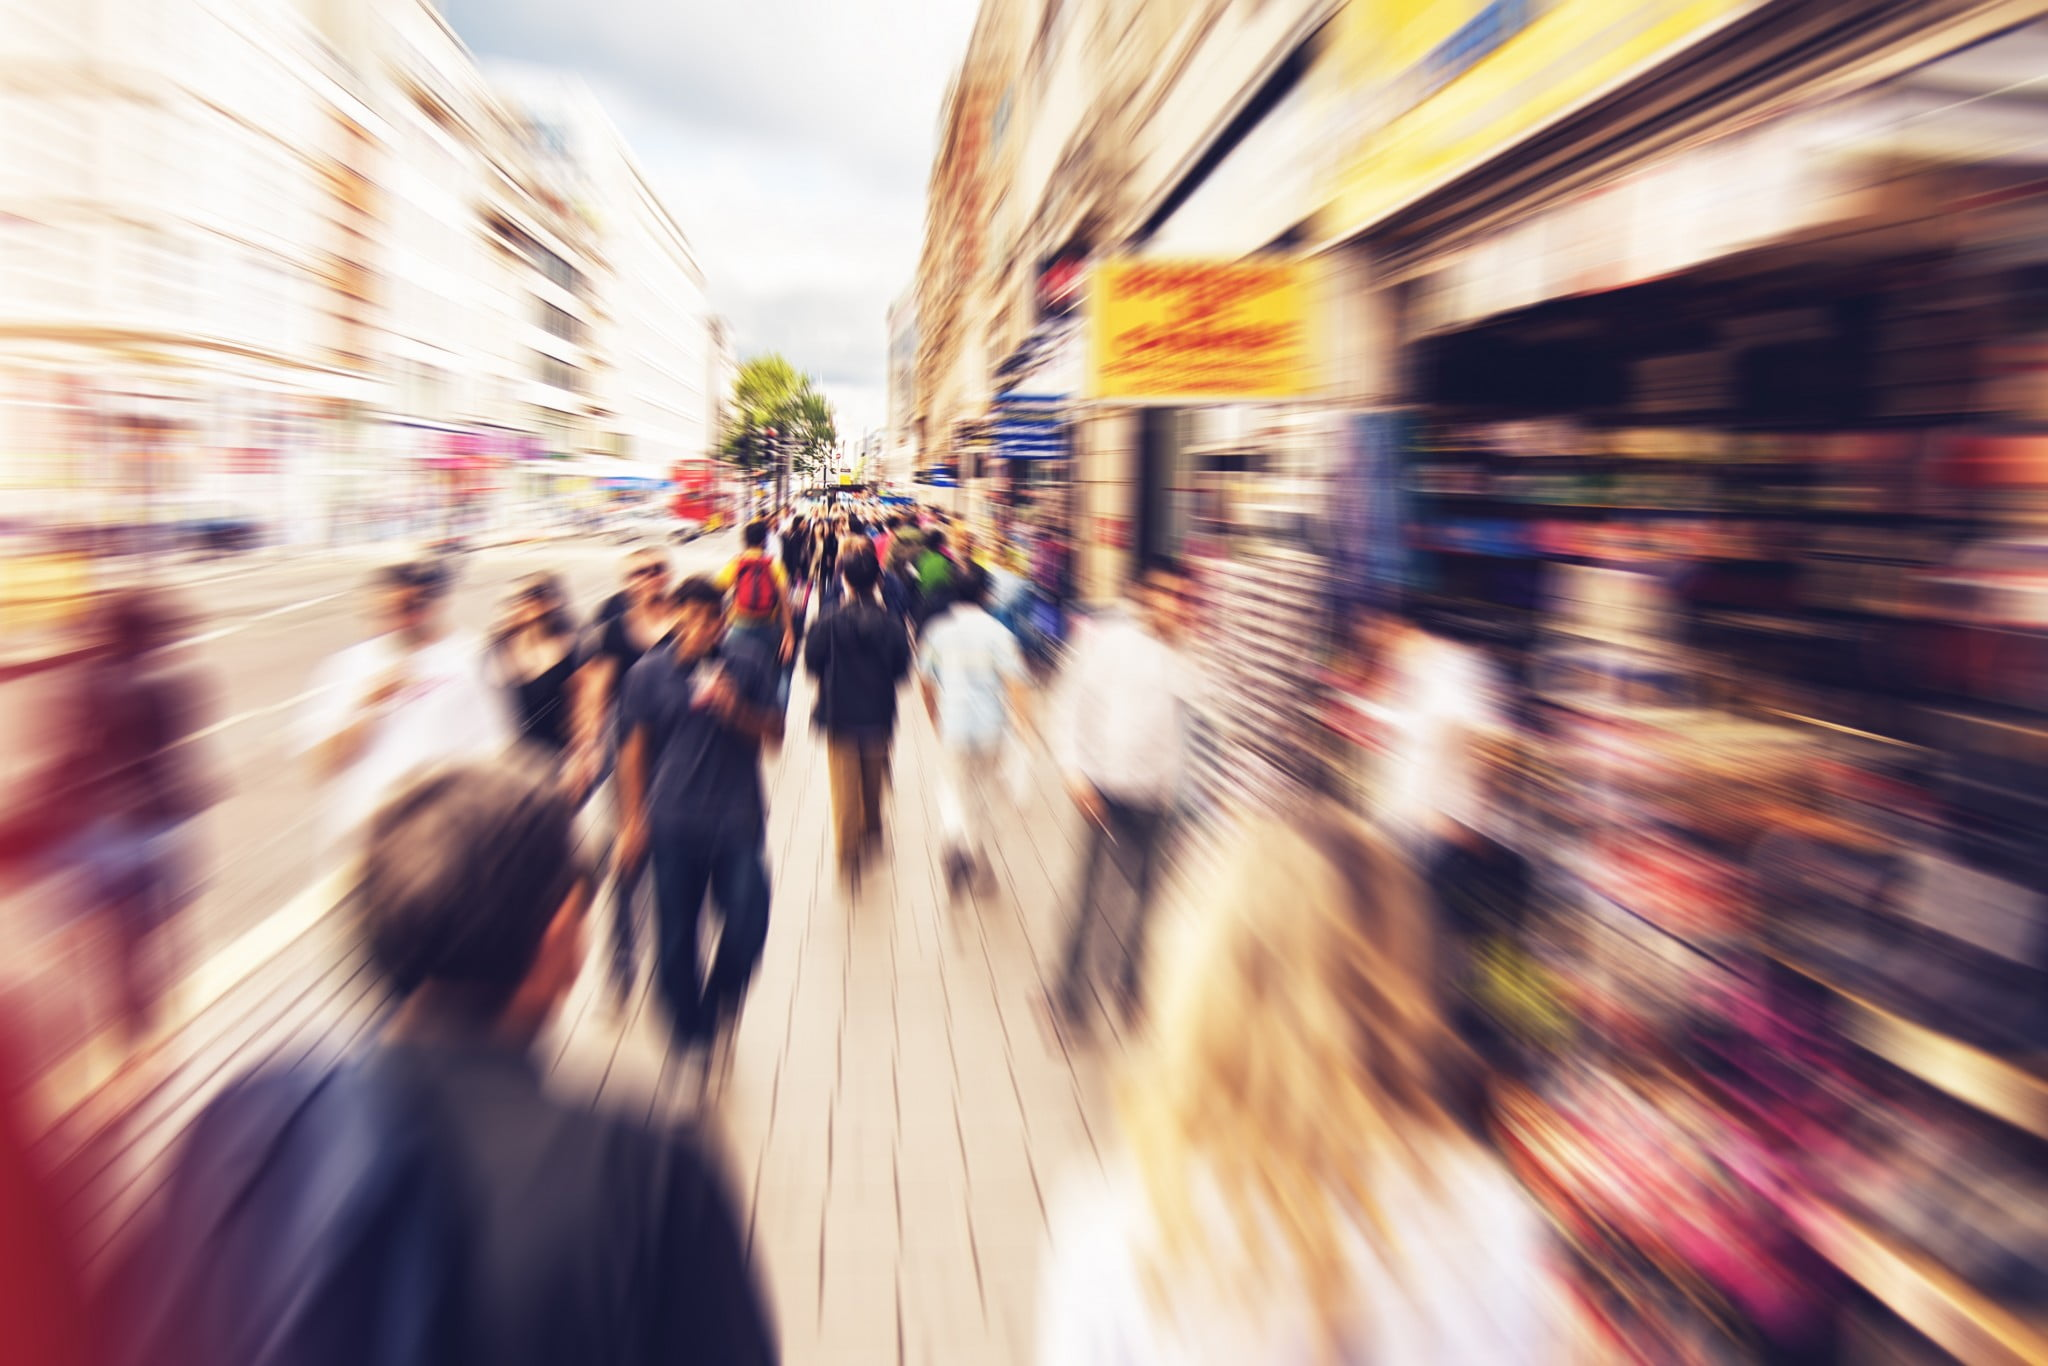 health on the high street: london's oxford street